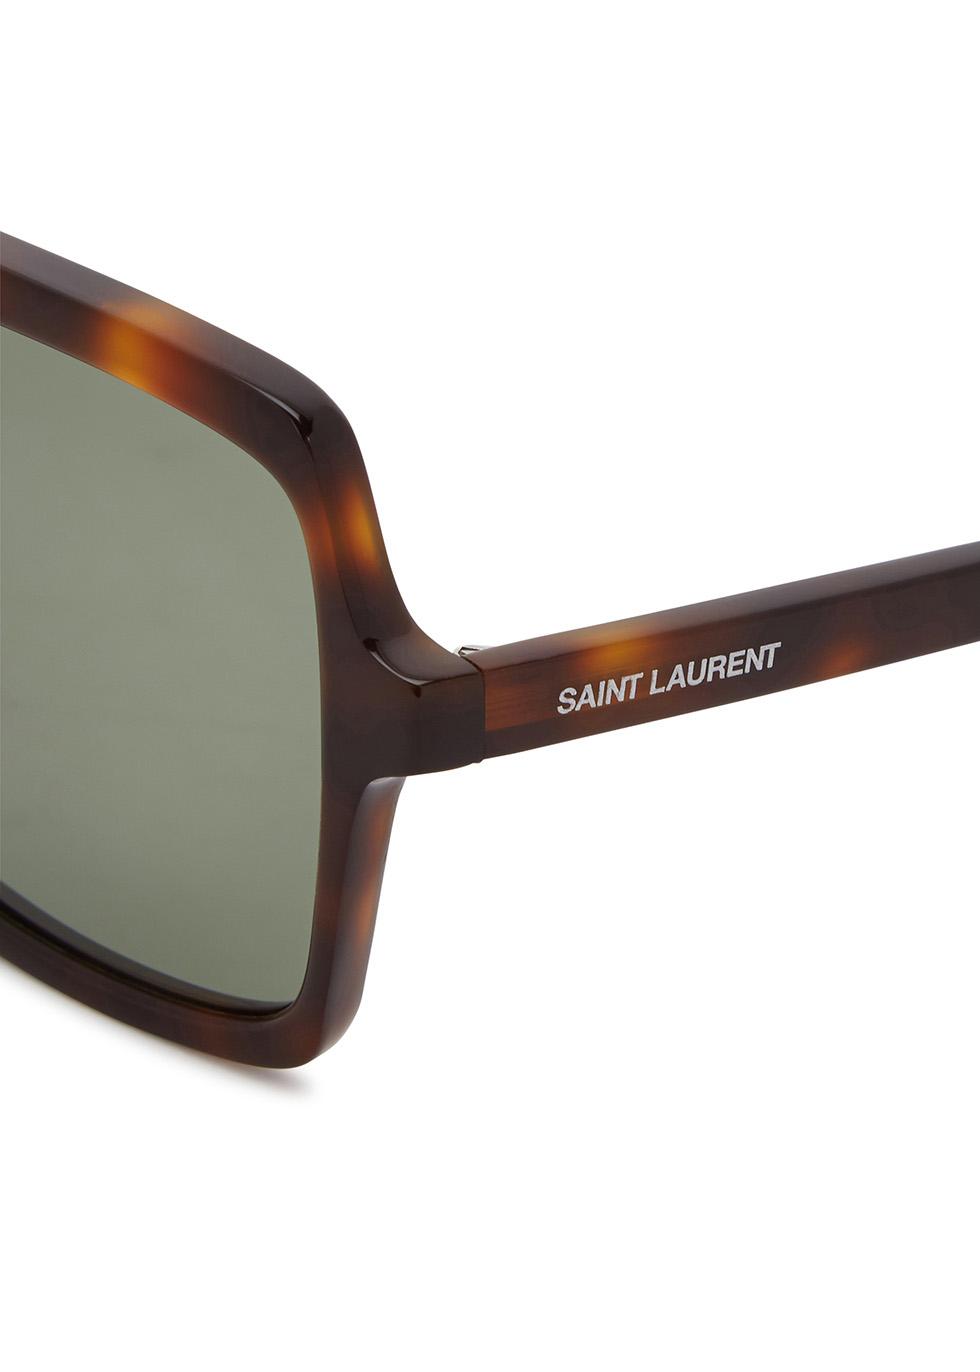 SL174 square-frame sunglasses - Saint Laurent